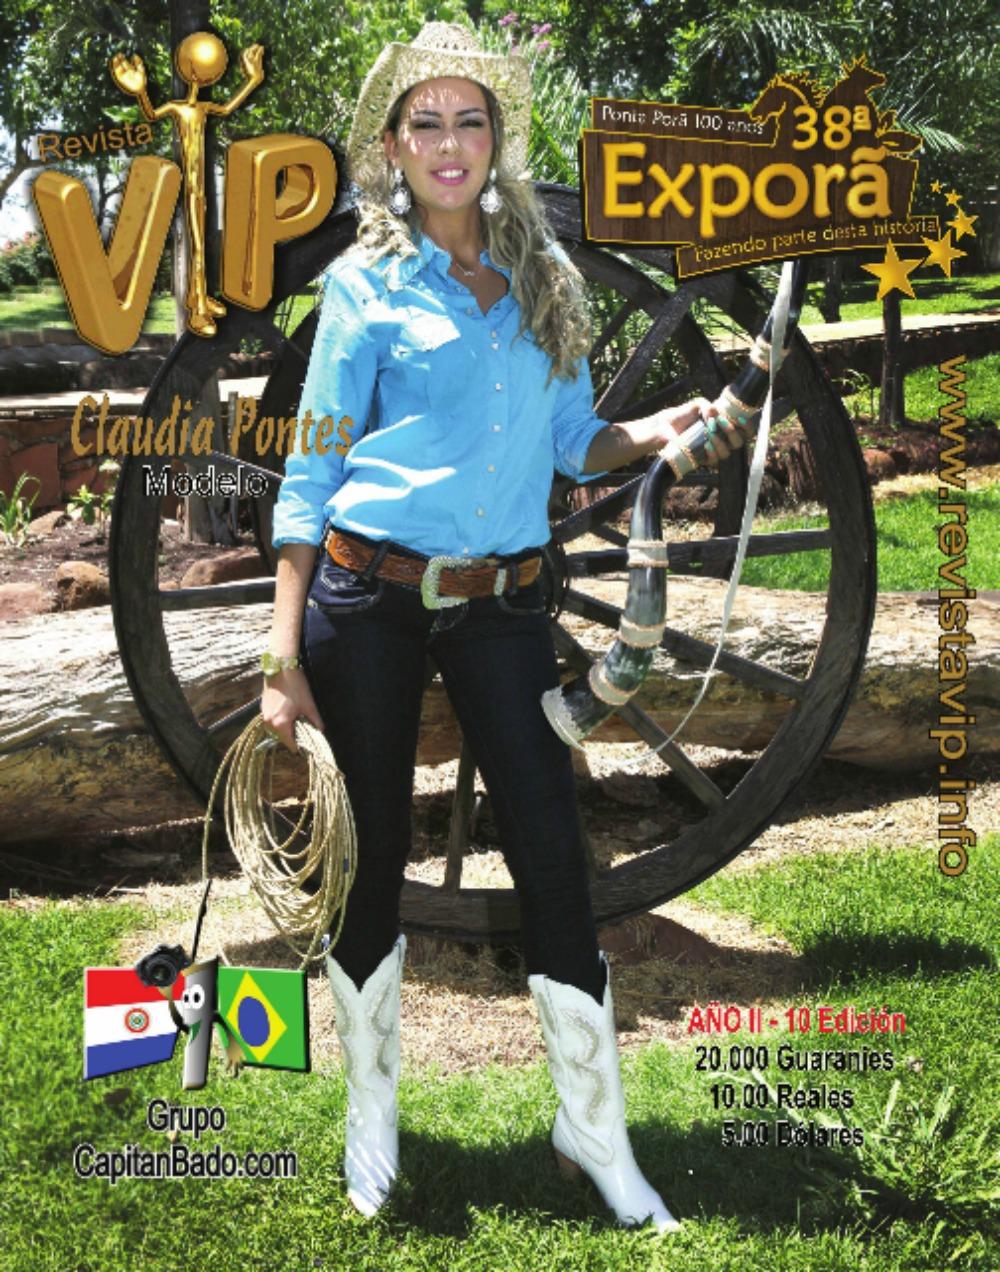 Vip 10 Paraguay